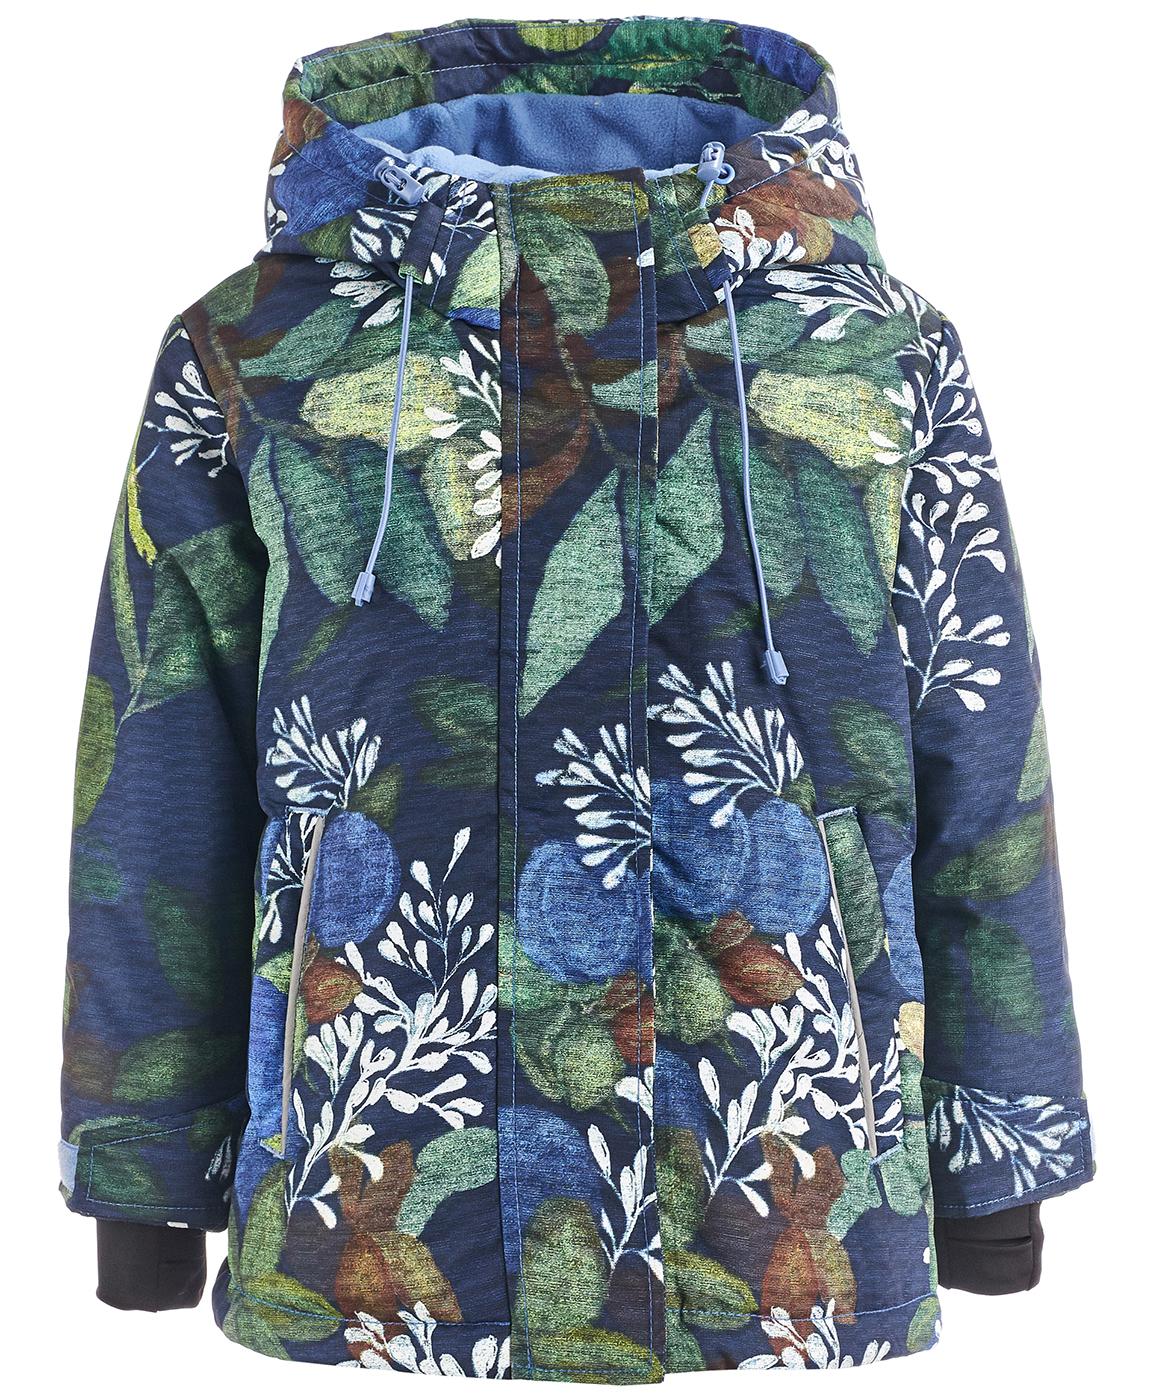 Купить 218BBGA41011014, Куртка Button Blue, BUTTON BLUE Active, синий, 128, Женский, ОСЕНЬ/ЗИМА 2018-2019 (shop: GulliverMarket Gulliver Market)